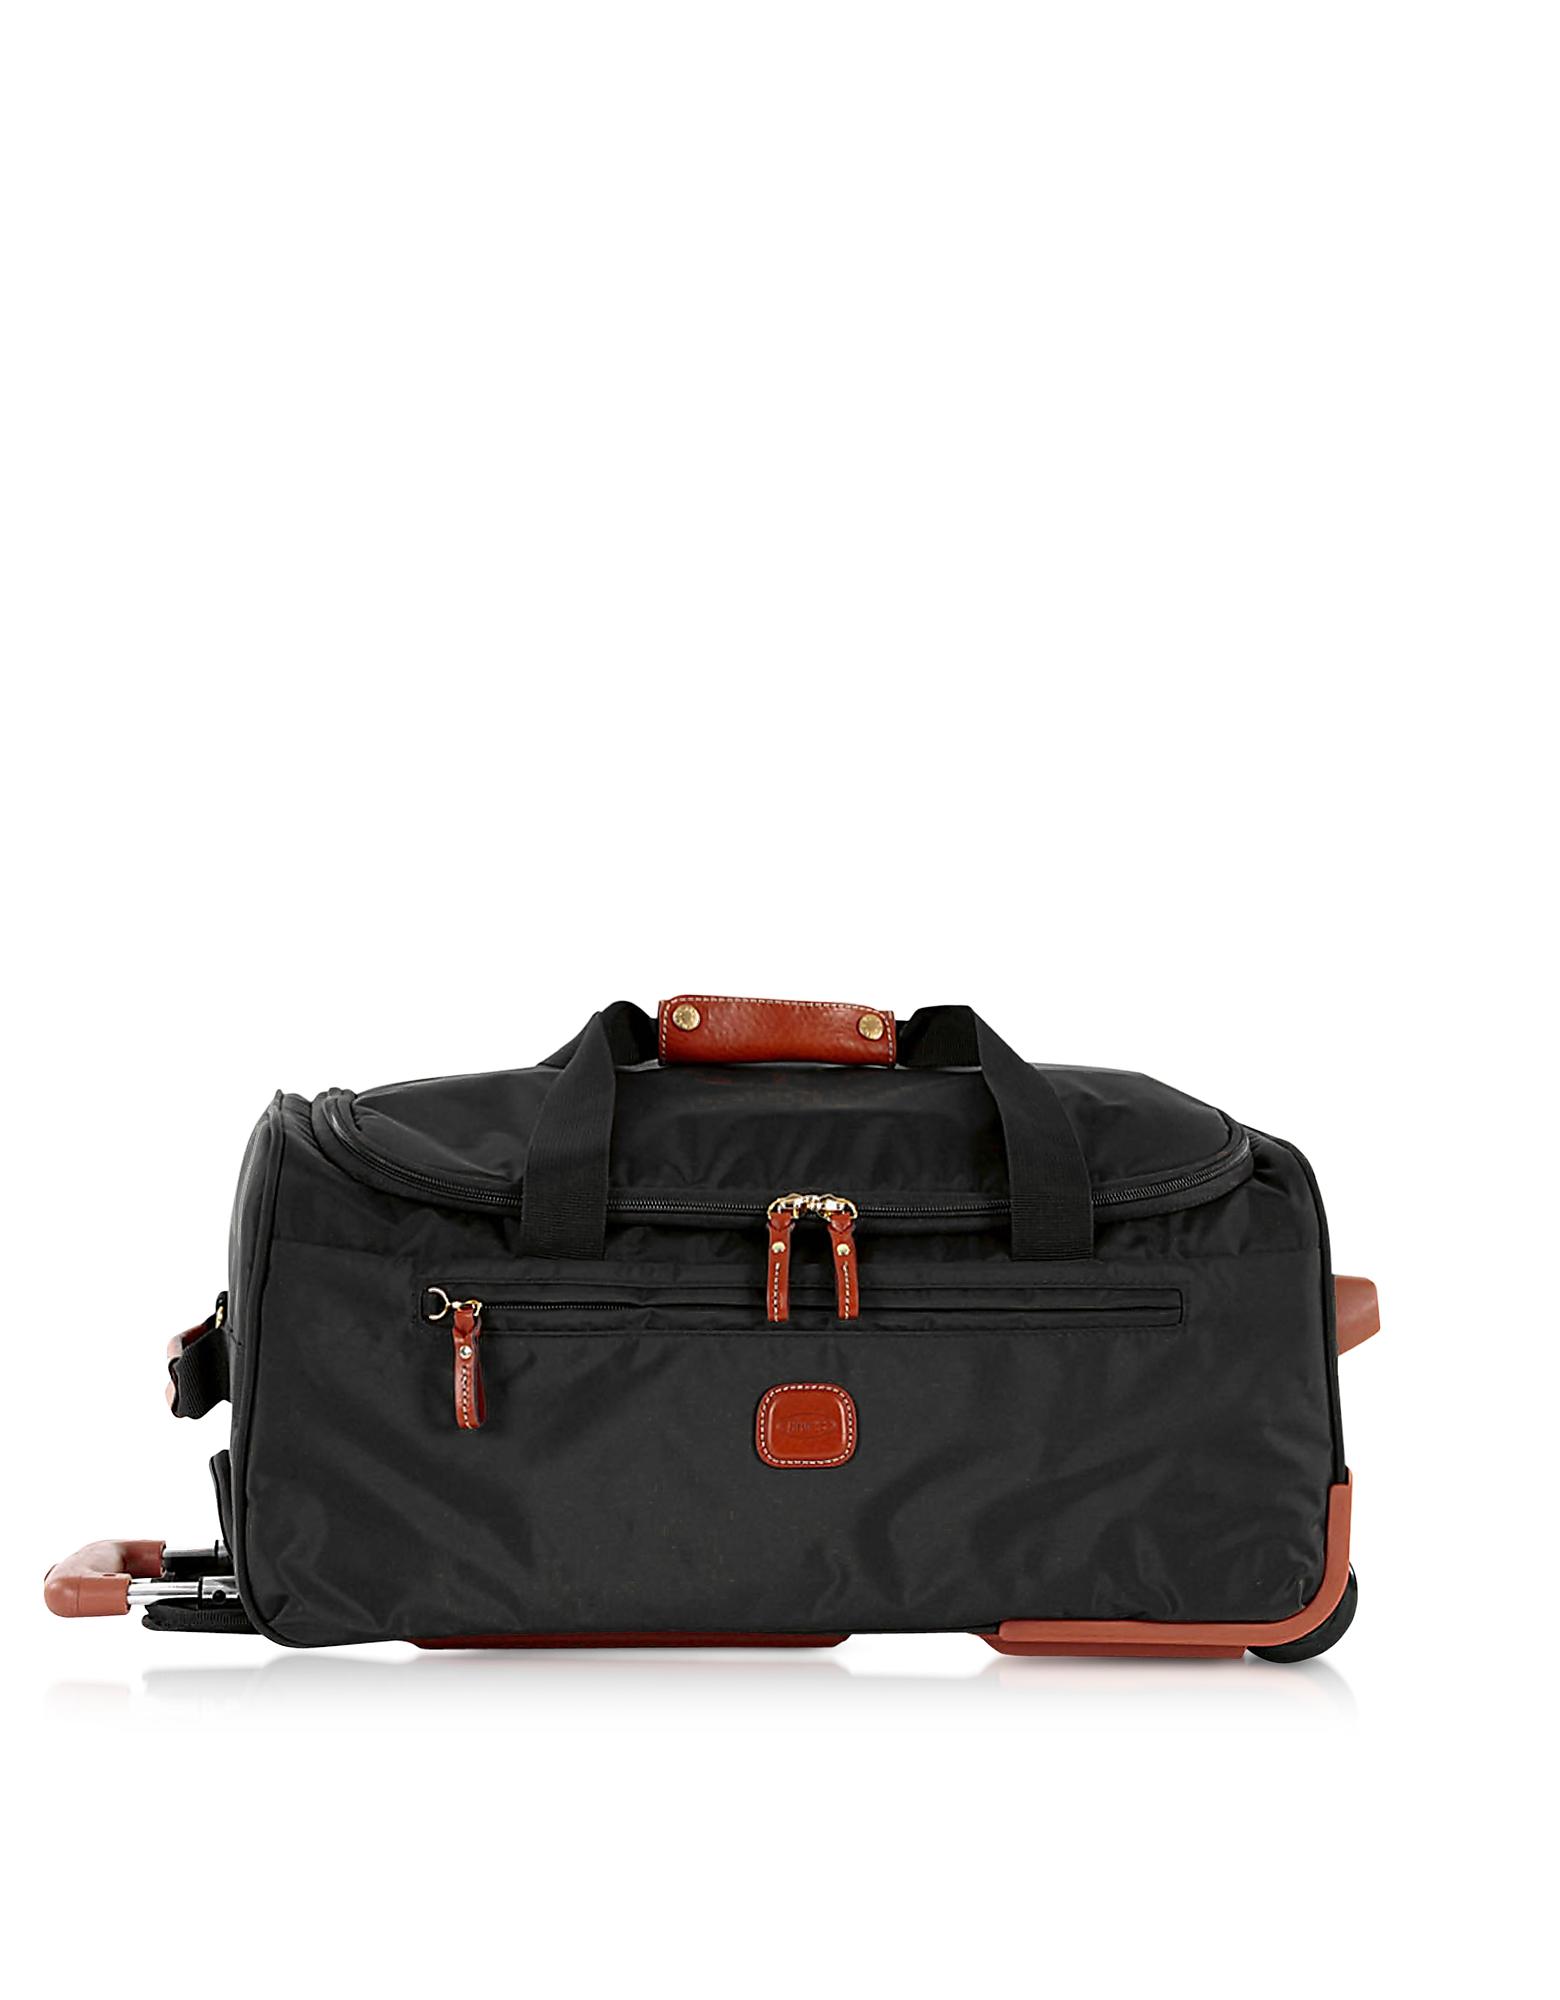 Bric's Travel Bags, X-Travel Medium Rolling Duffle Bag